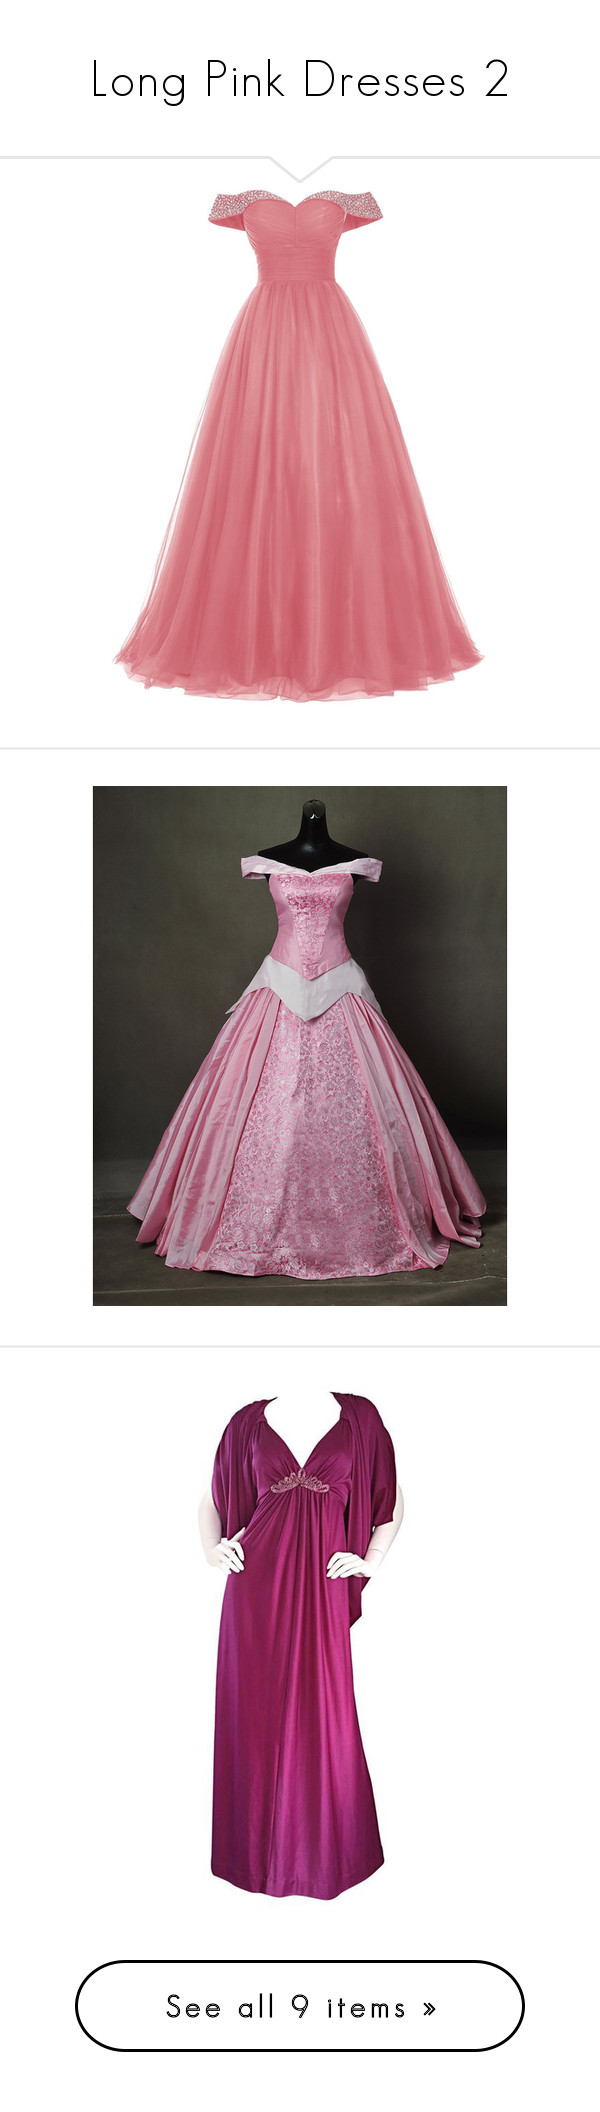 Long Pink Dresses 2\